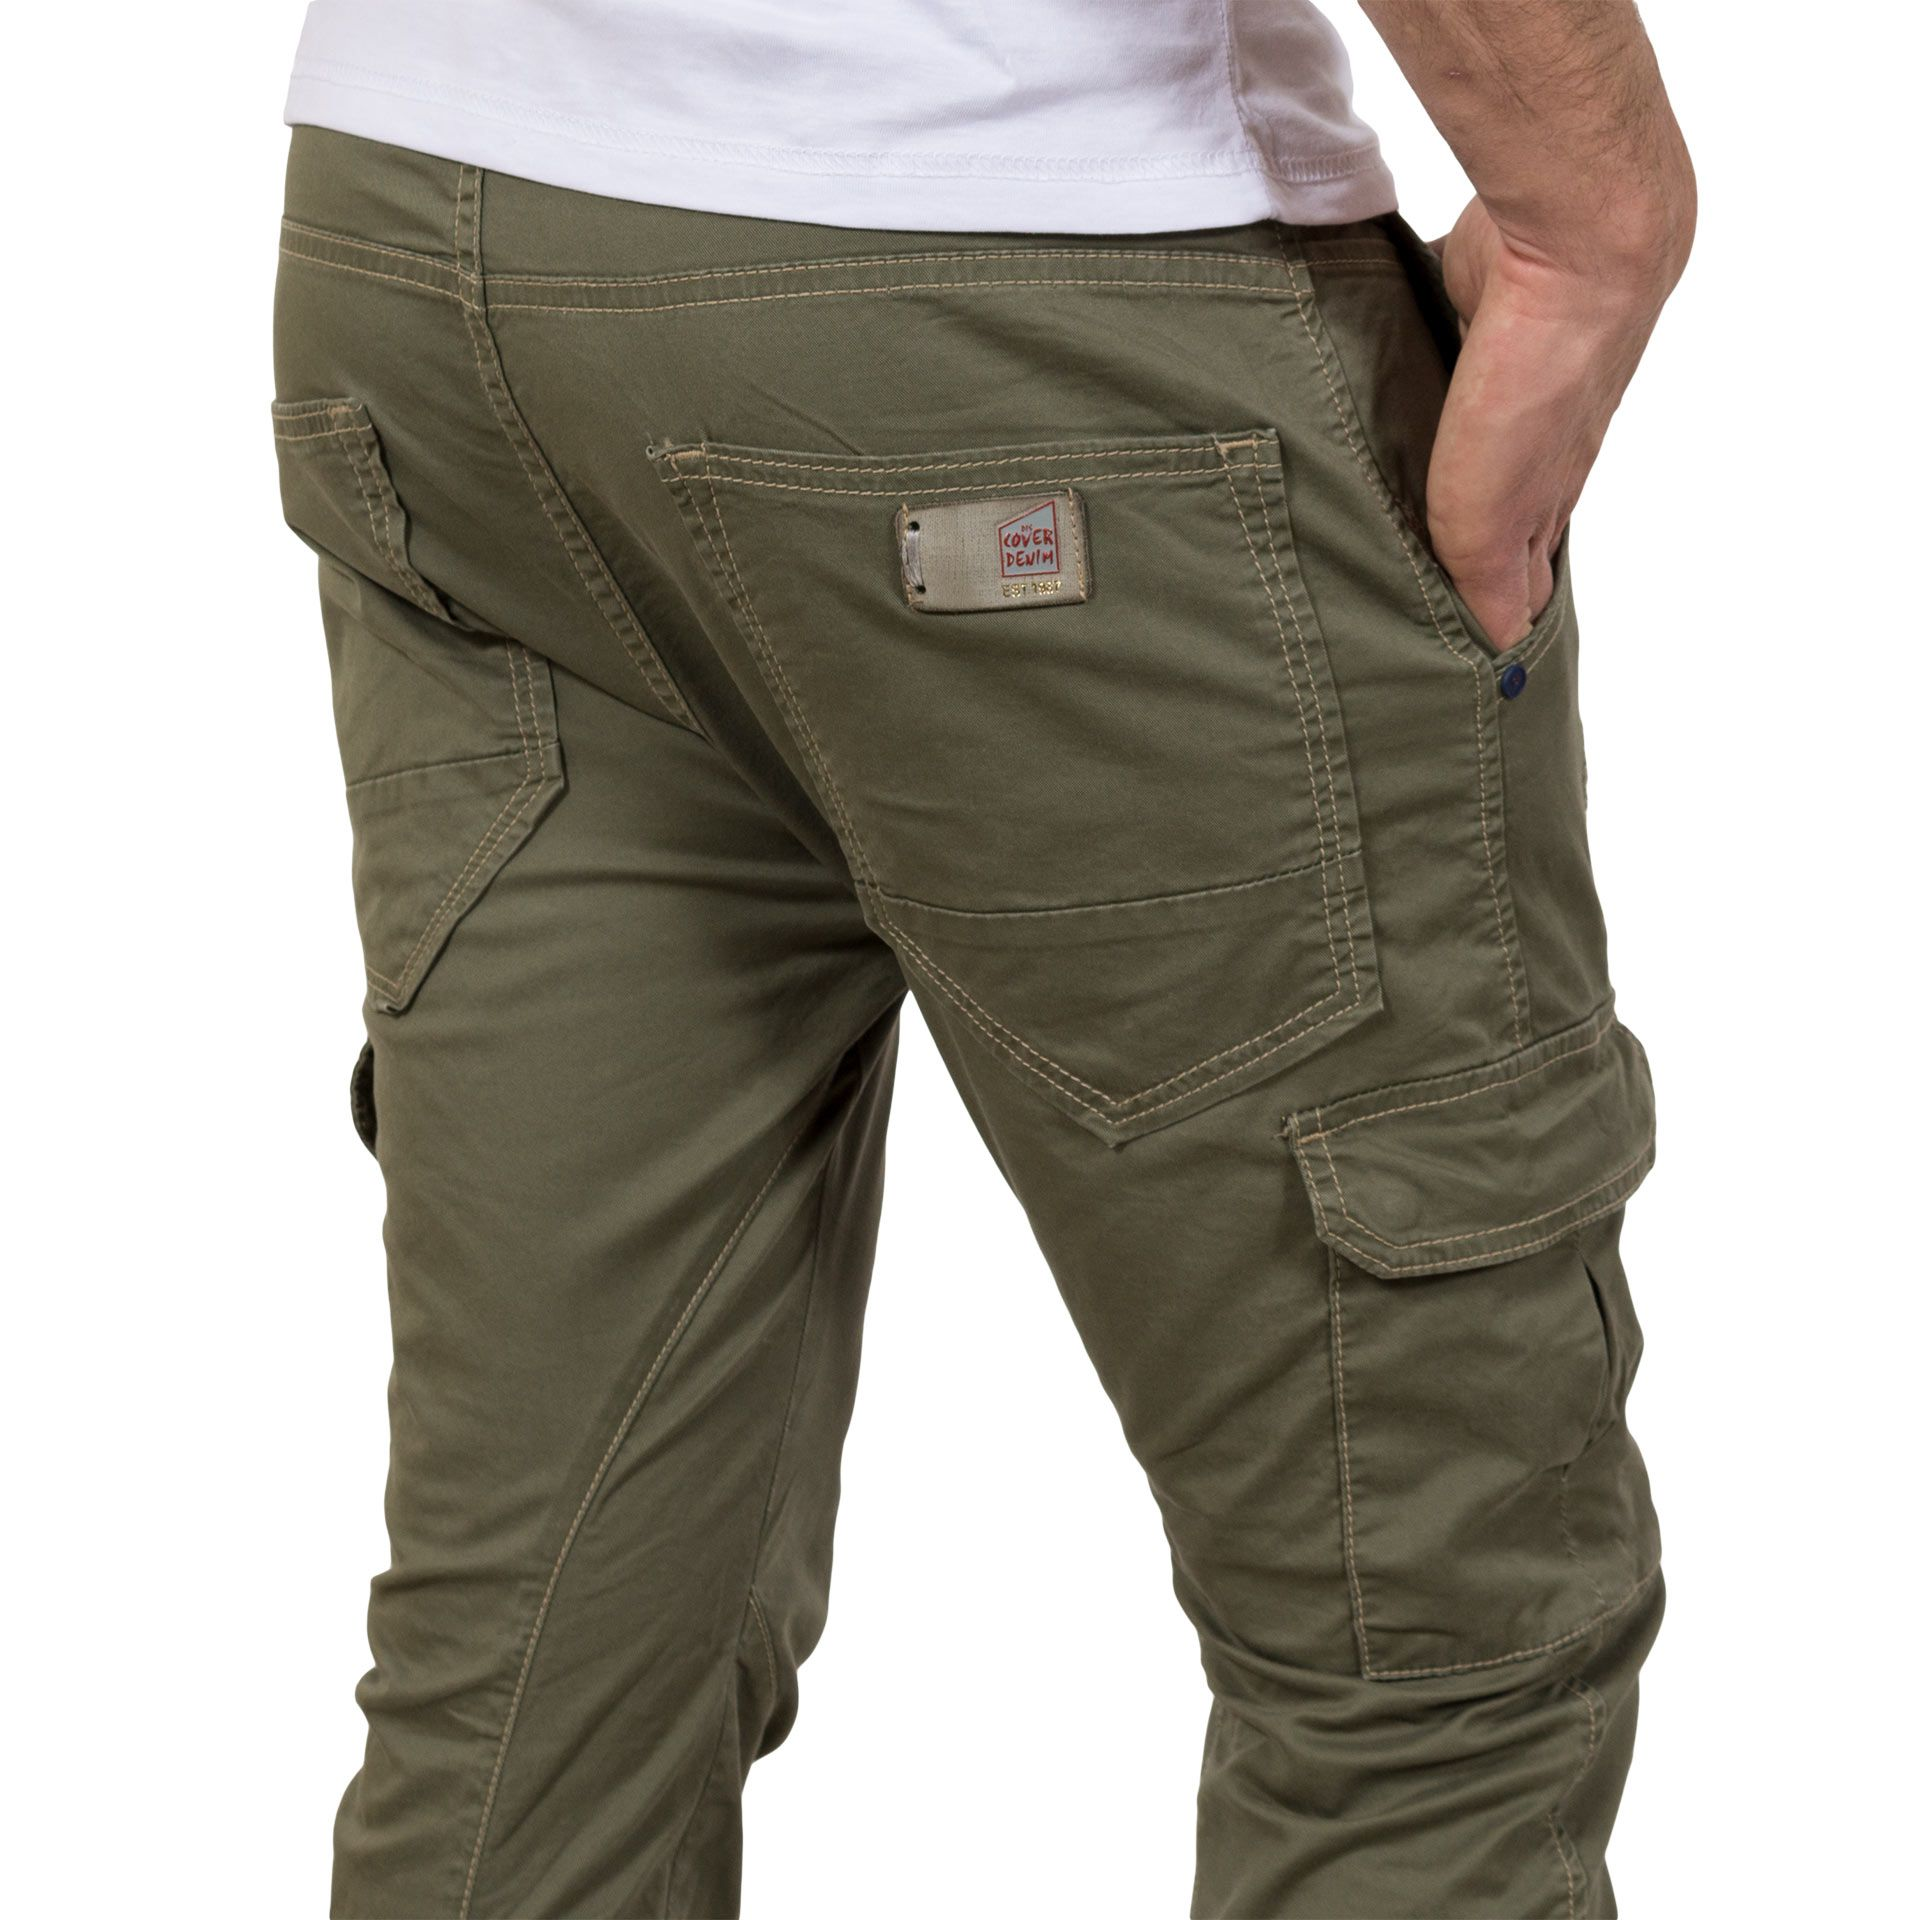 Cargo Παντελόνι Chinos με λάστιχα COVER Jeans Loft 7482 Χακί ... 0c48dfa51e1